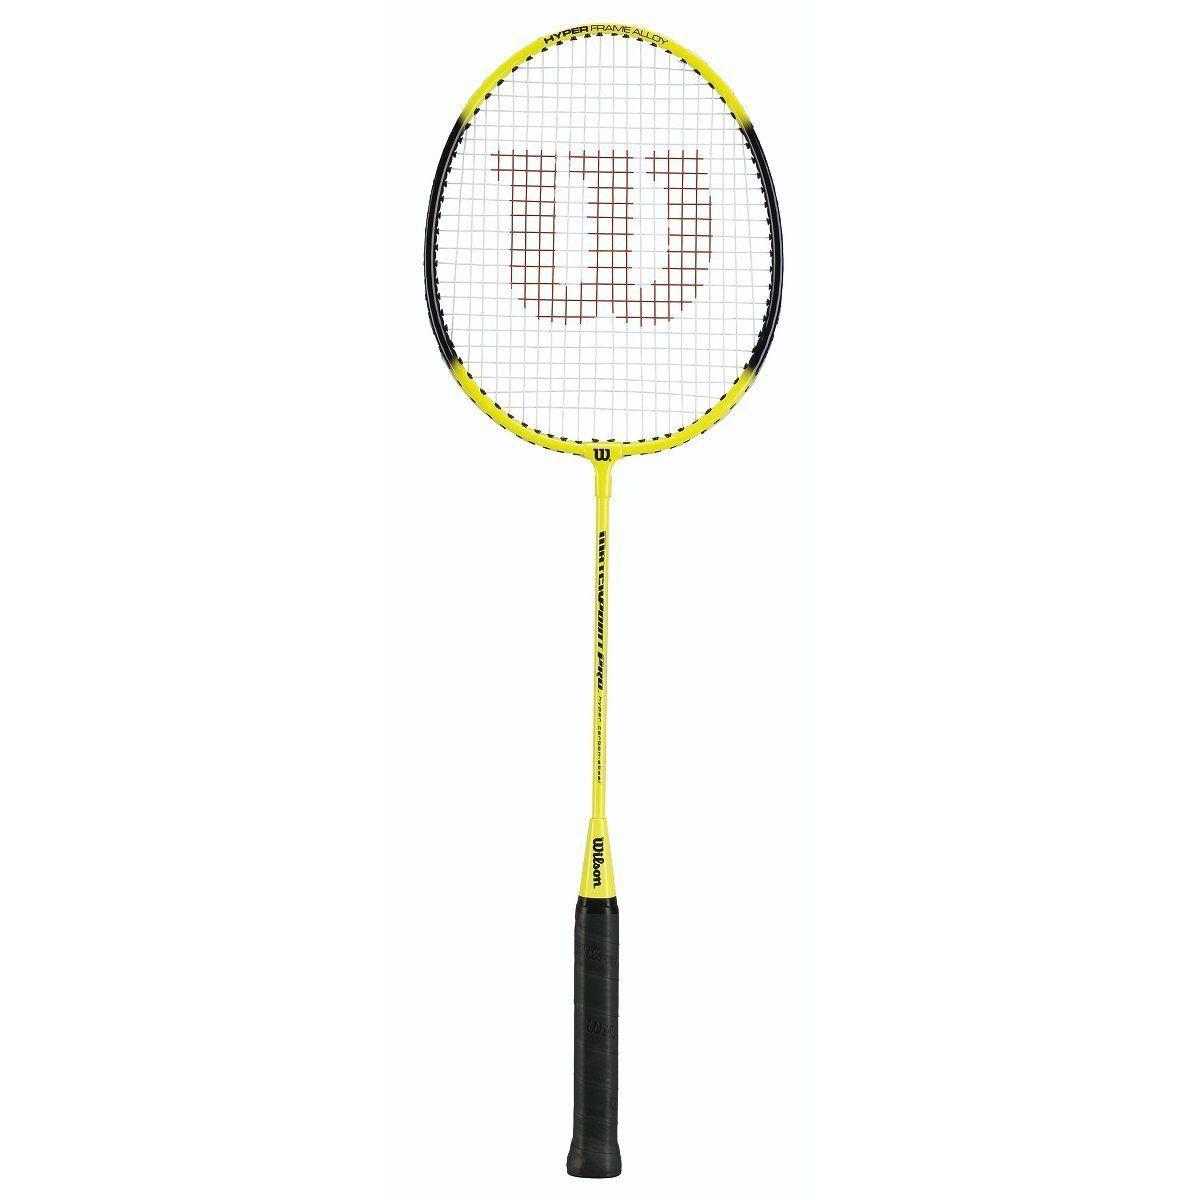 Pin by Arslan Khan on SPORTS GOOD | Badminton racket